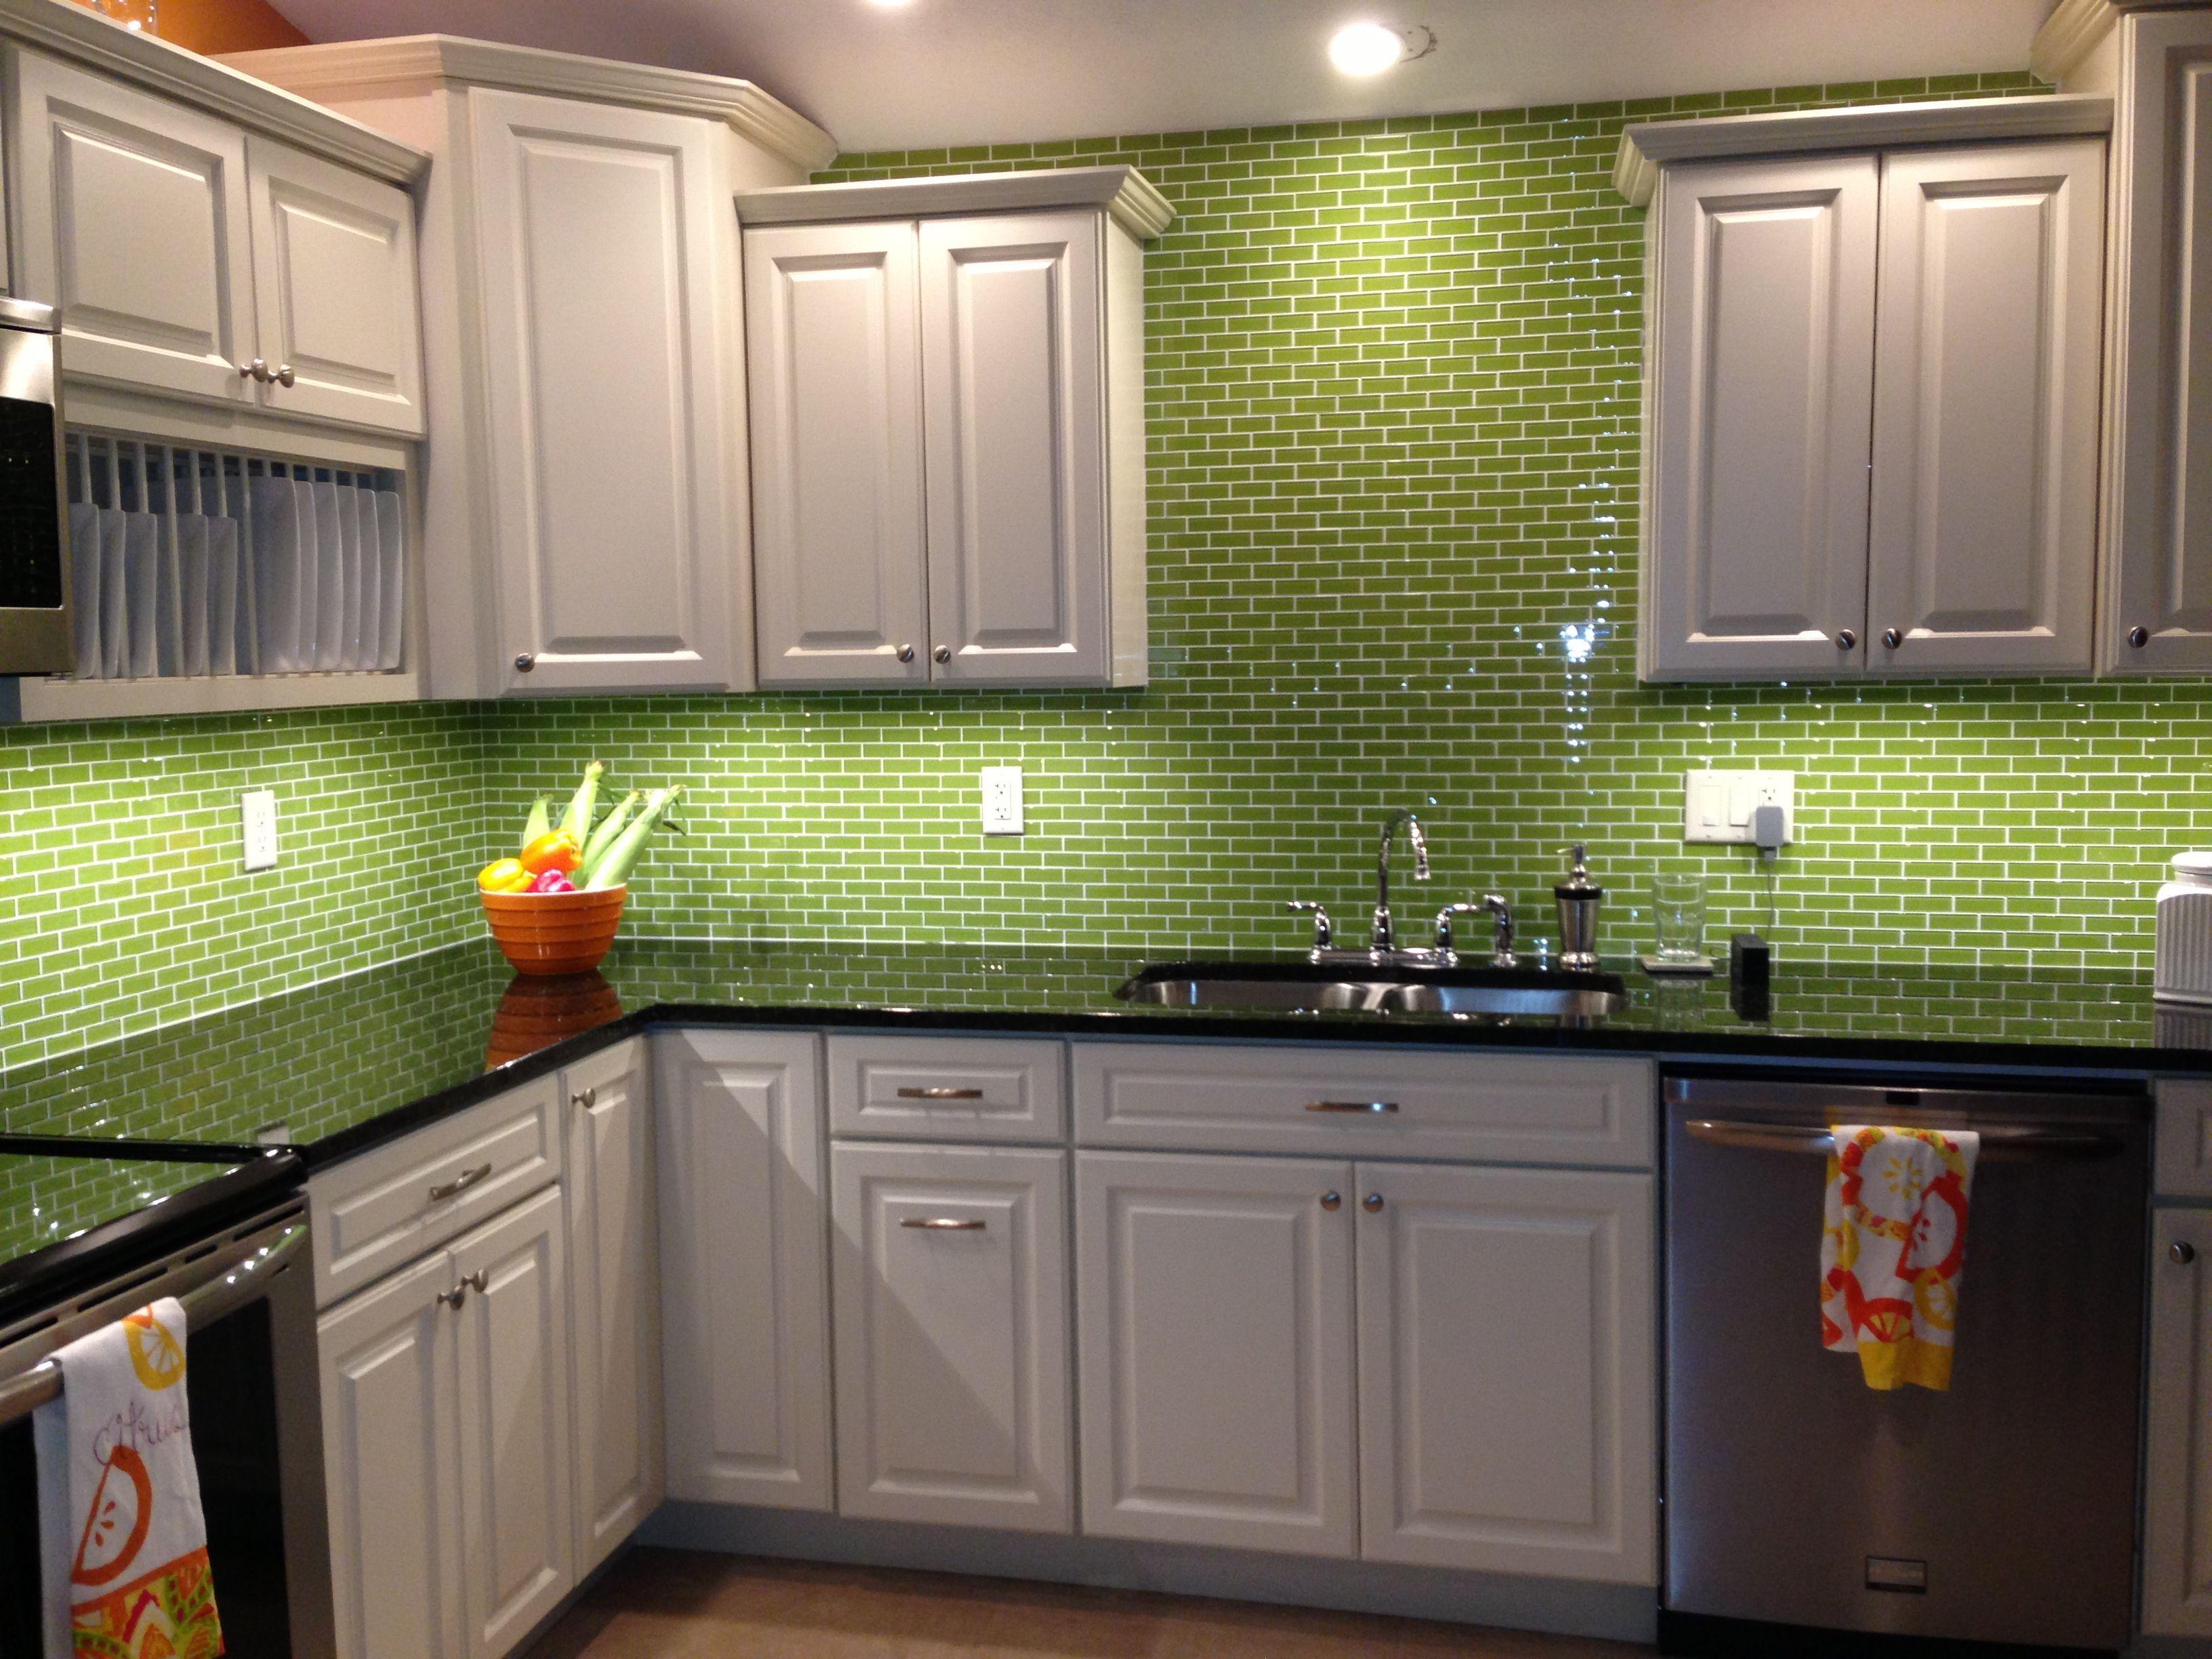 Extraordinary Green Backsplash Tile For Kitchen Green Kitchen